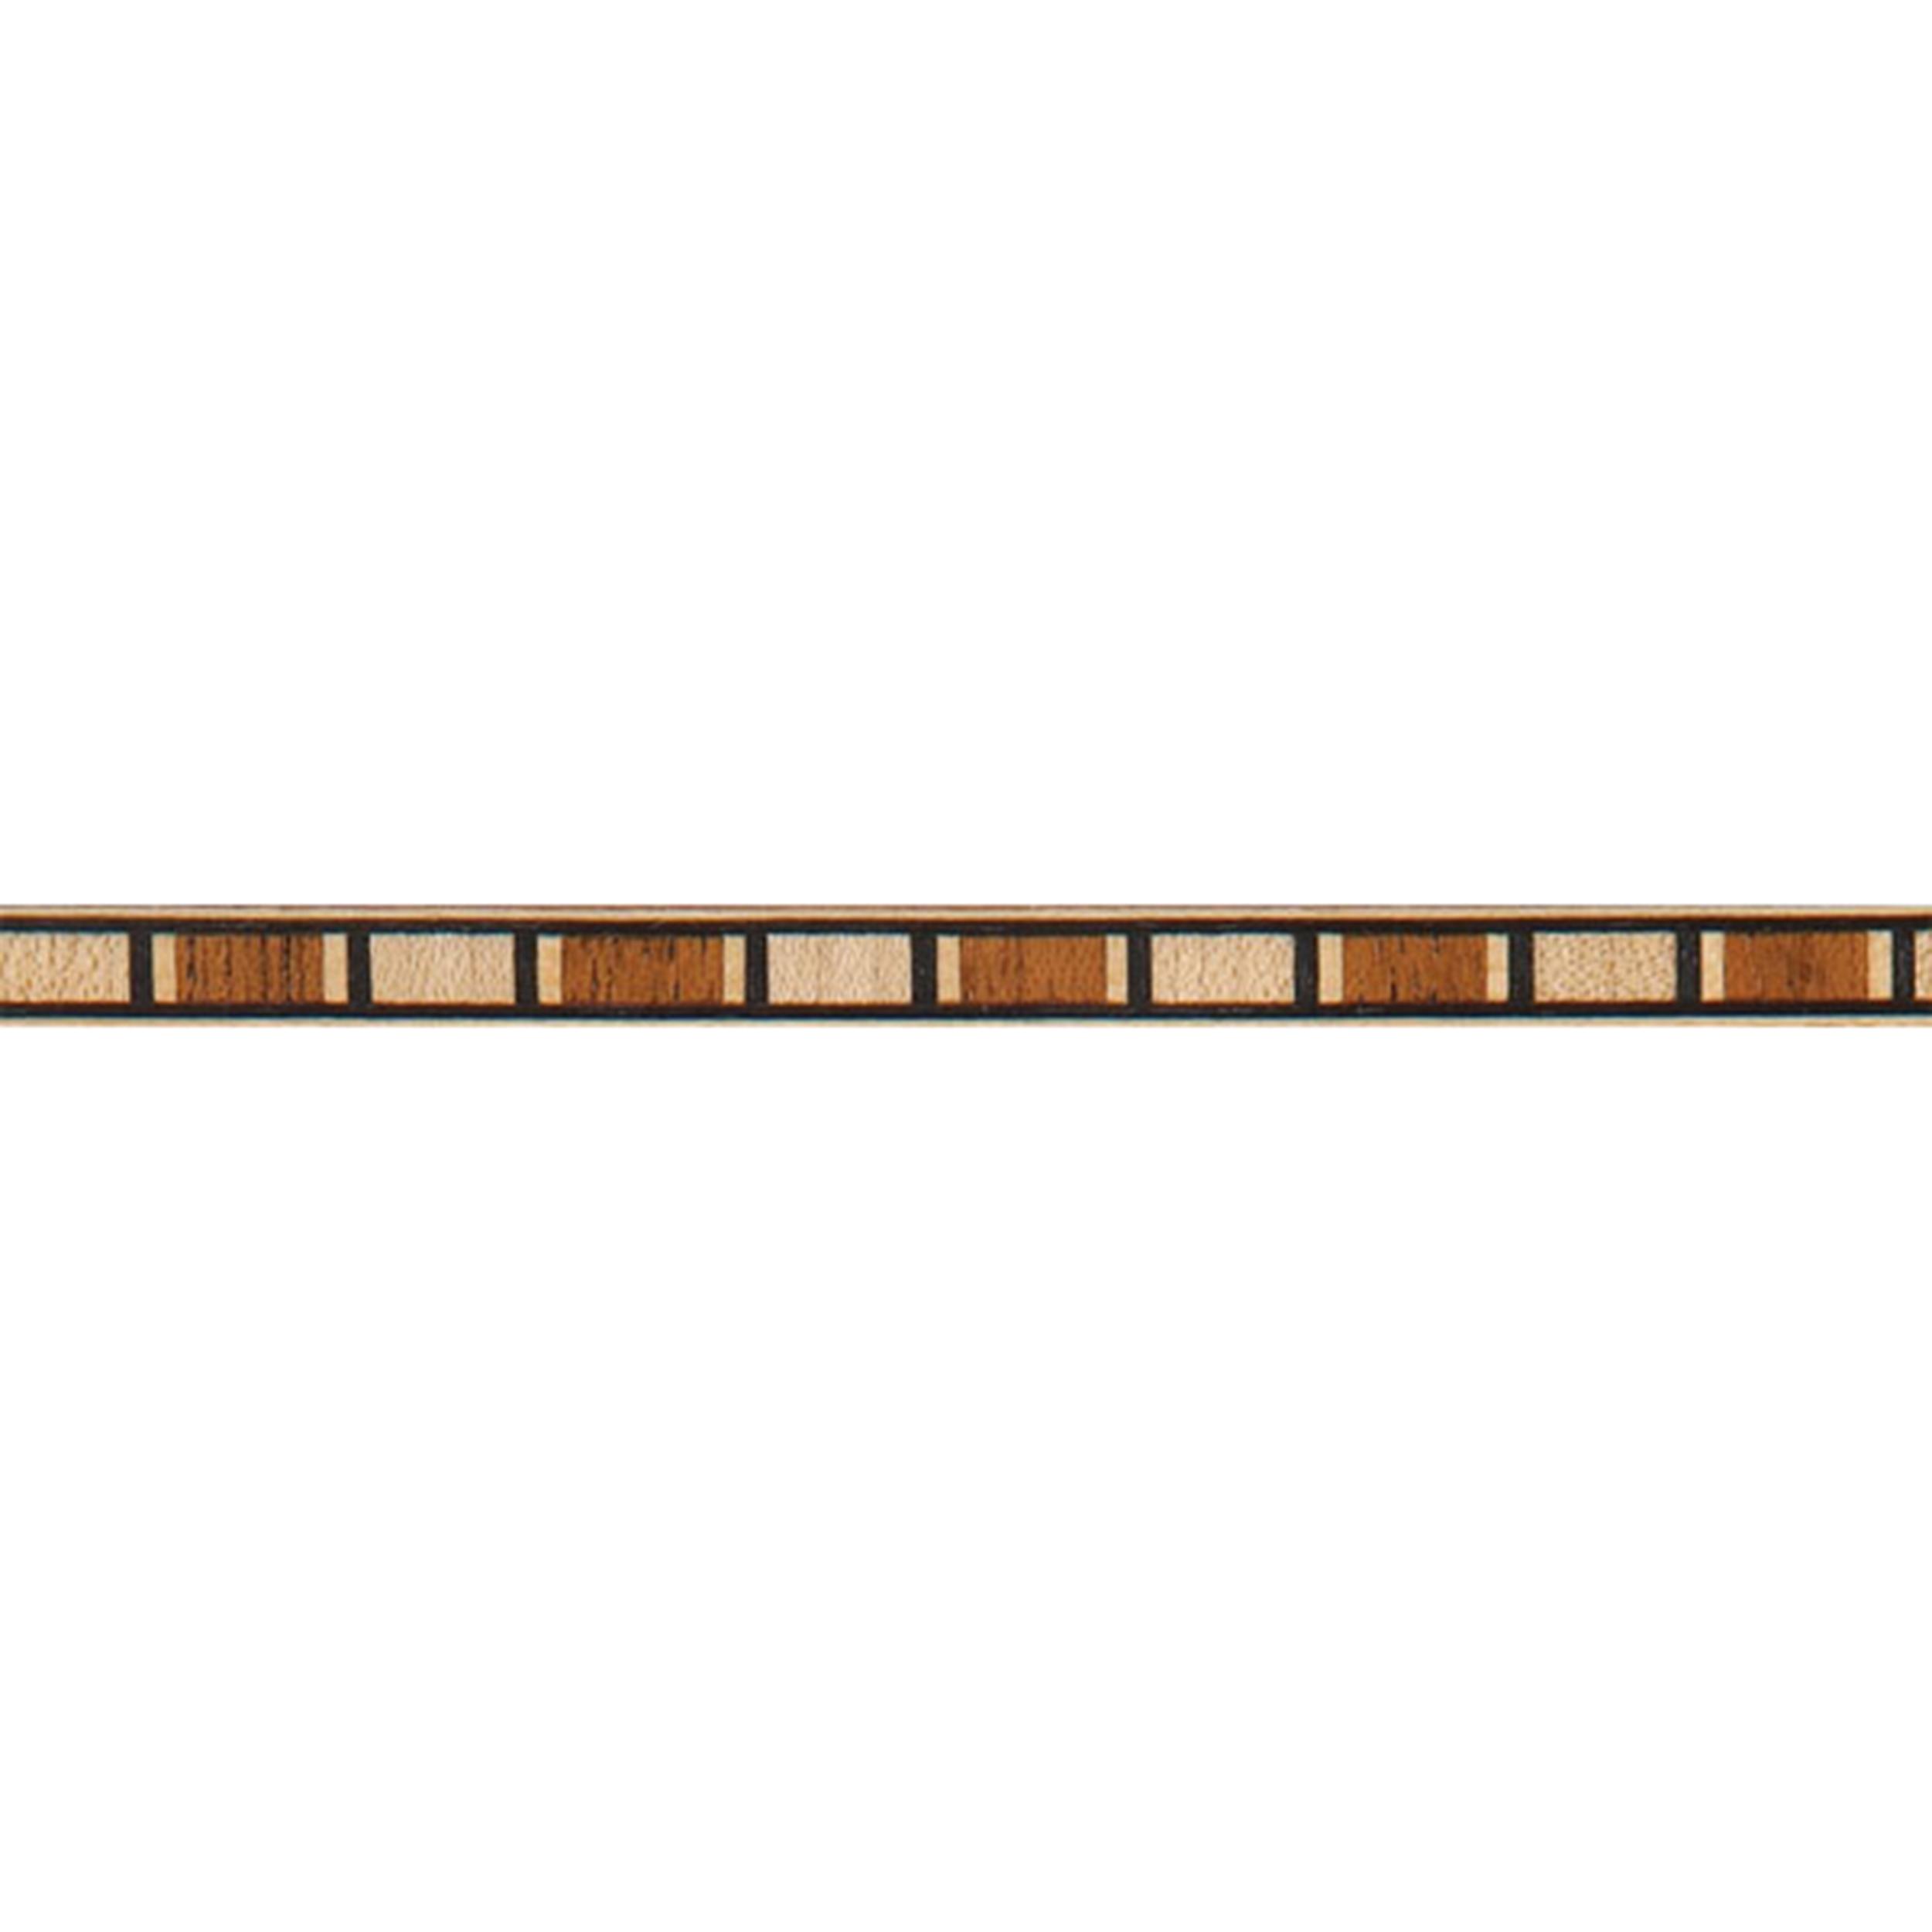 Wood Inlay Strip #16 1/4